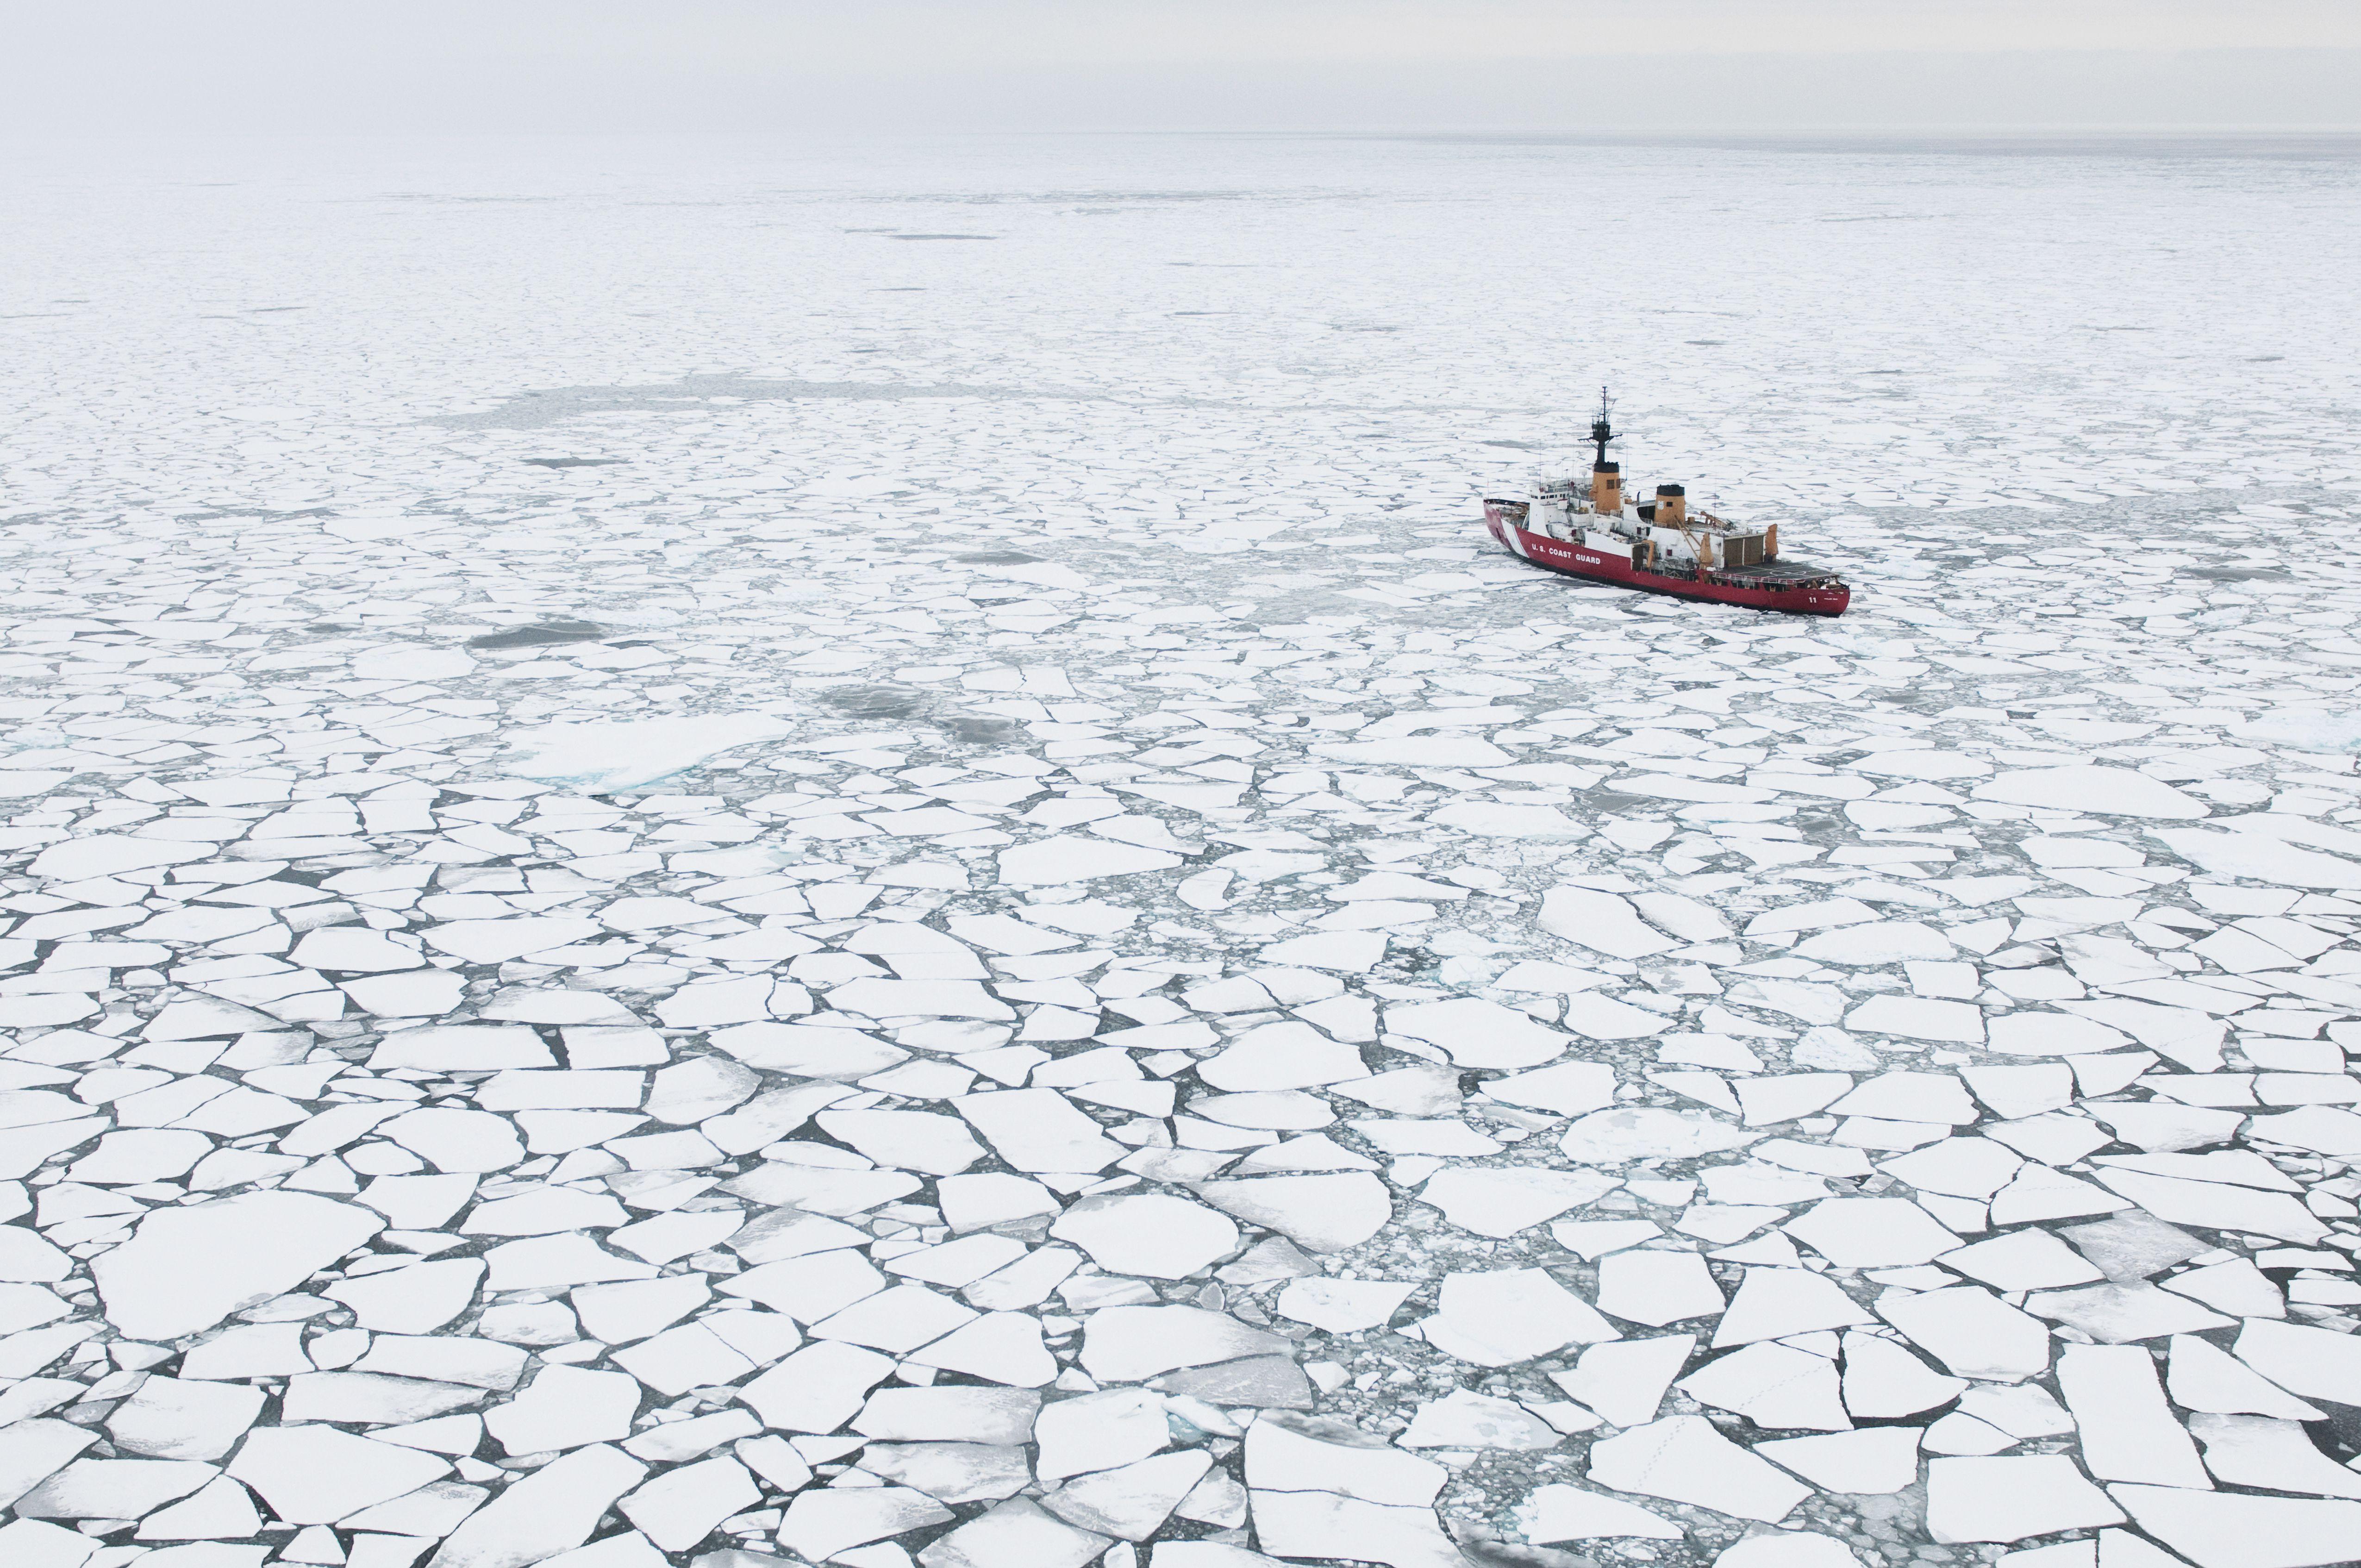 USCGC Polar Sea Icebreaker in the arctic pack ice of Beaufort Sea